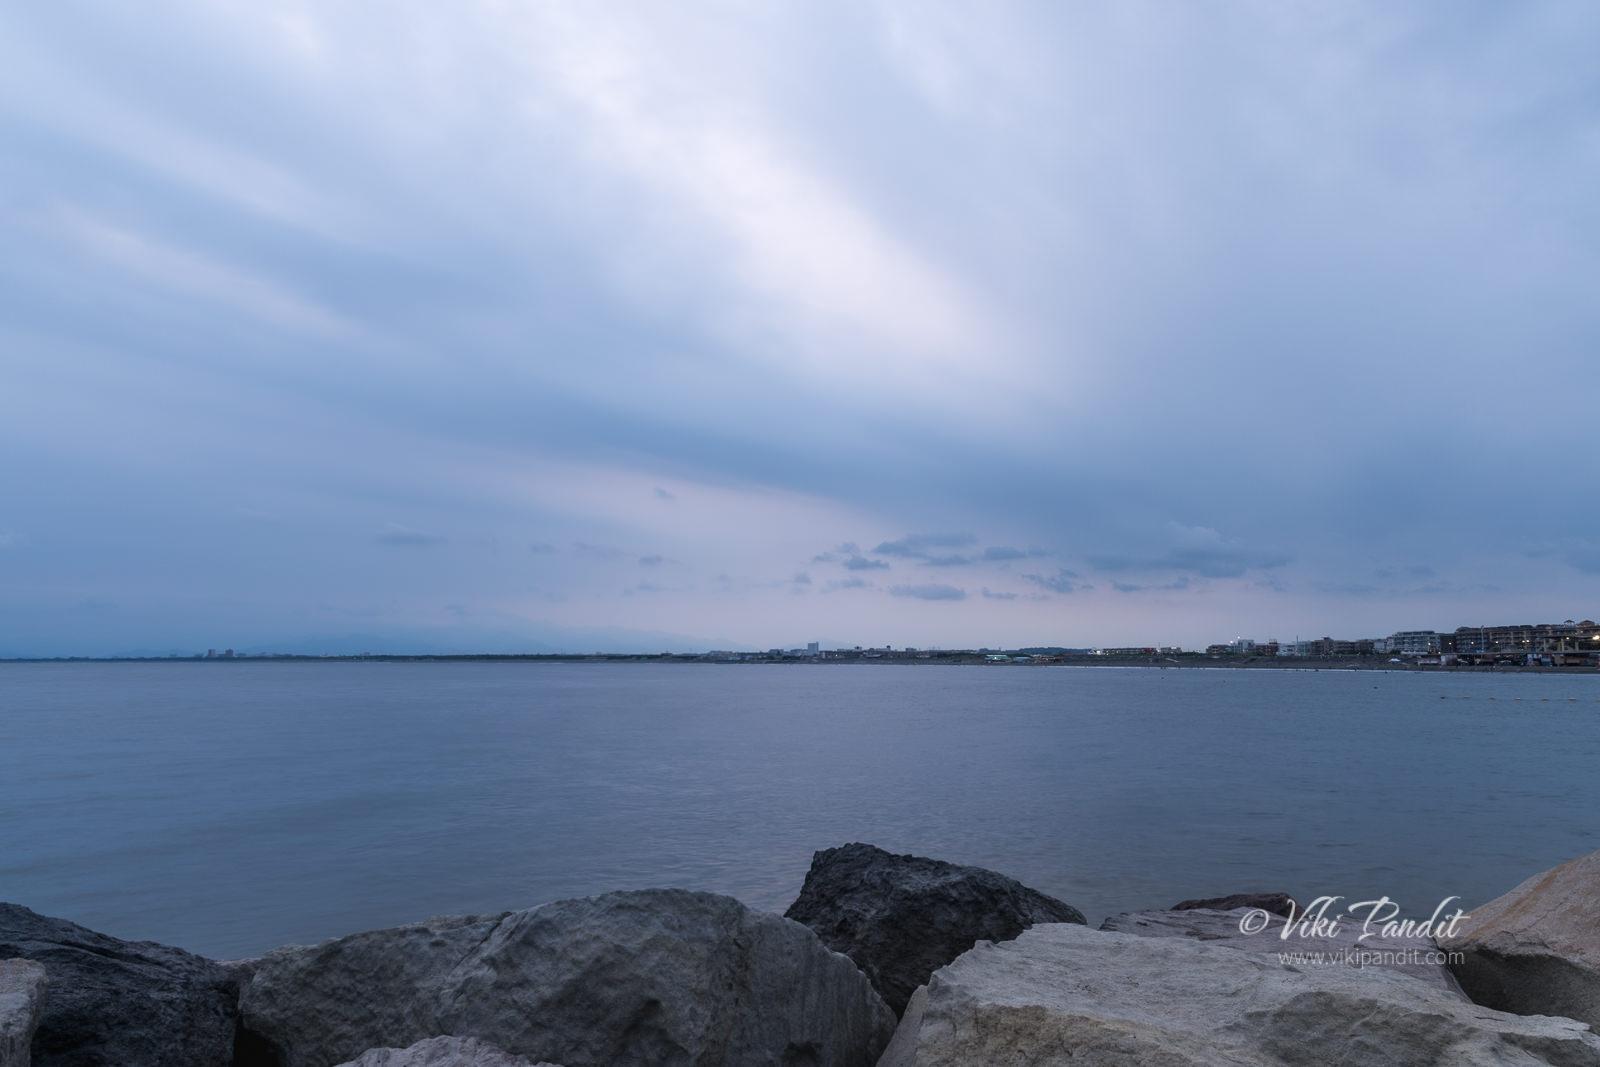 Rocks along wooden pier at Shonan